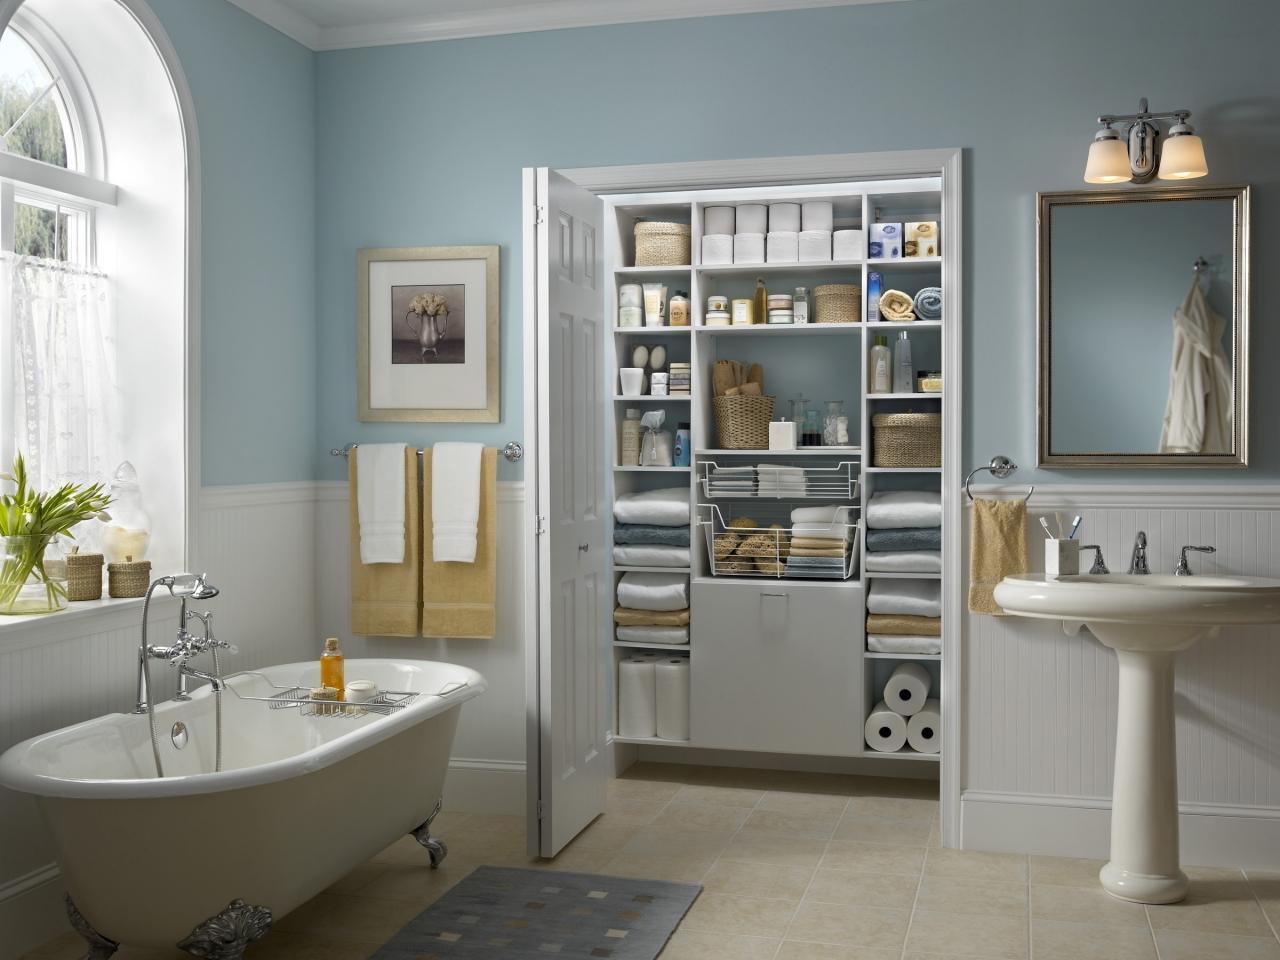 Bifold Closet Doors Options and Replacement